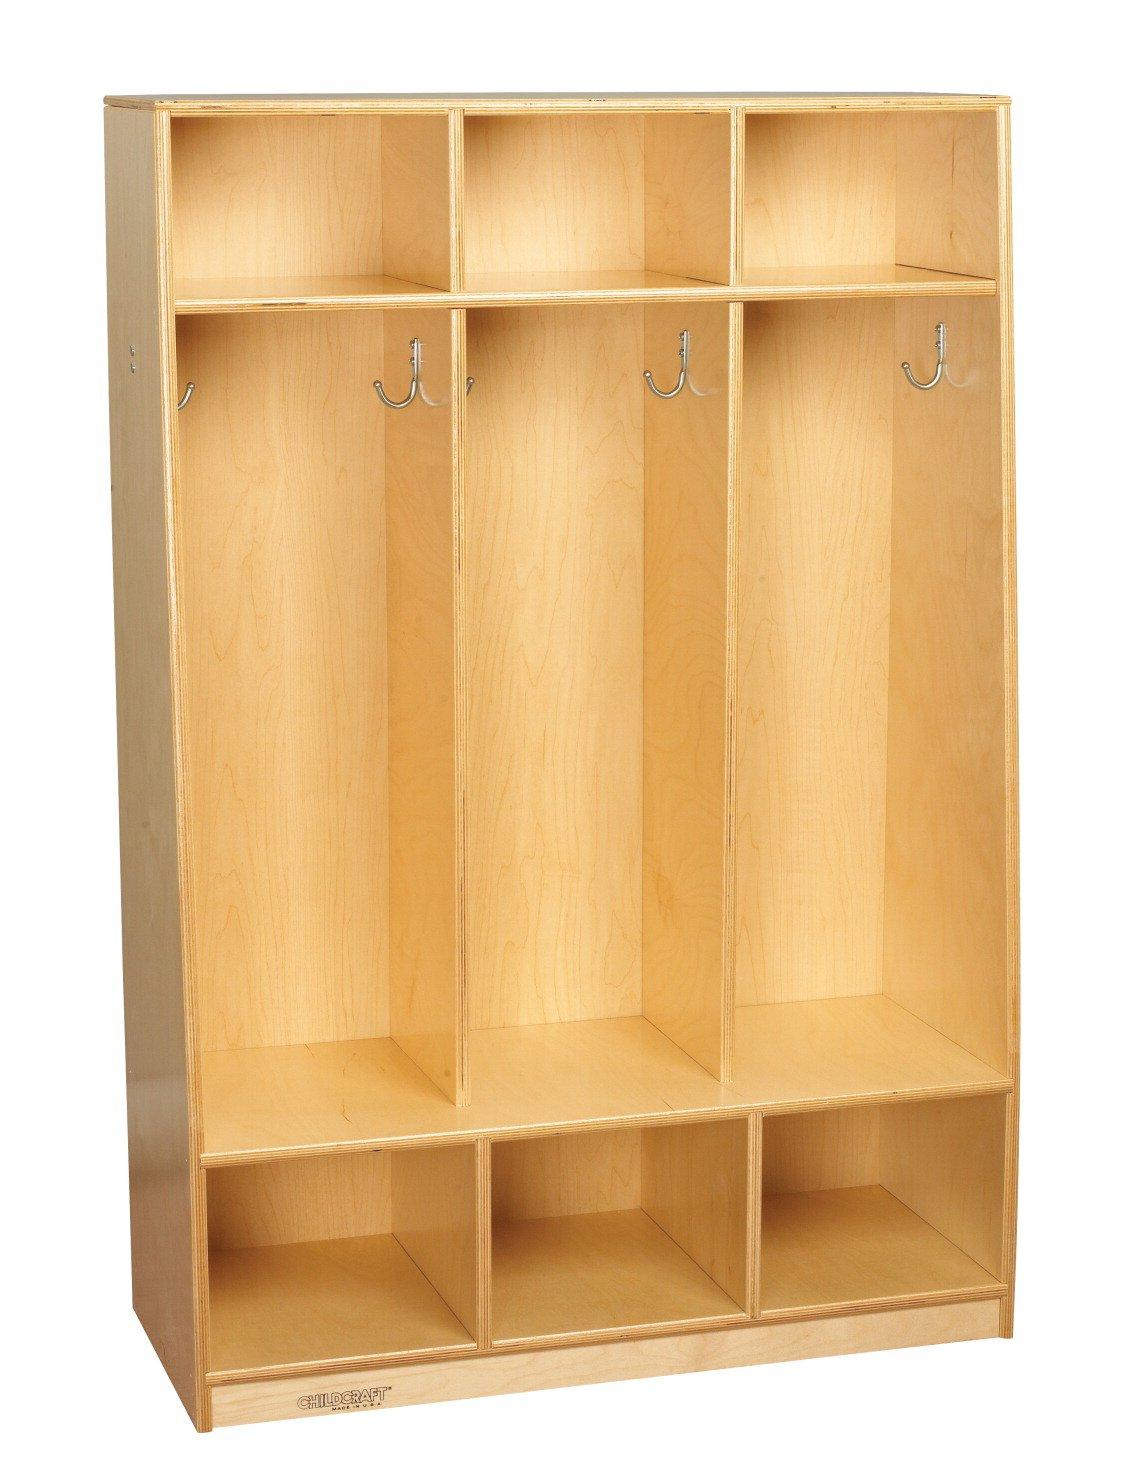 Childcraft 1403214 Bench Coat Locker, 3-Unit, Wood, 32-1/2'' x 13-3/4'' x 48'', Natural Wood Tone